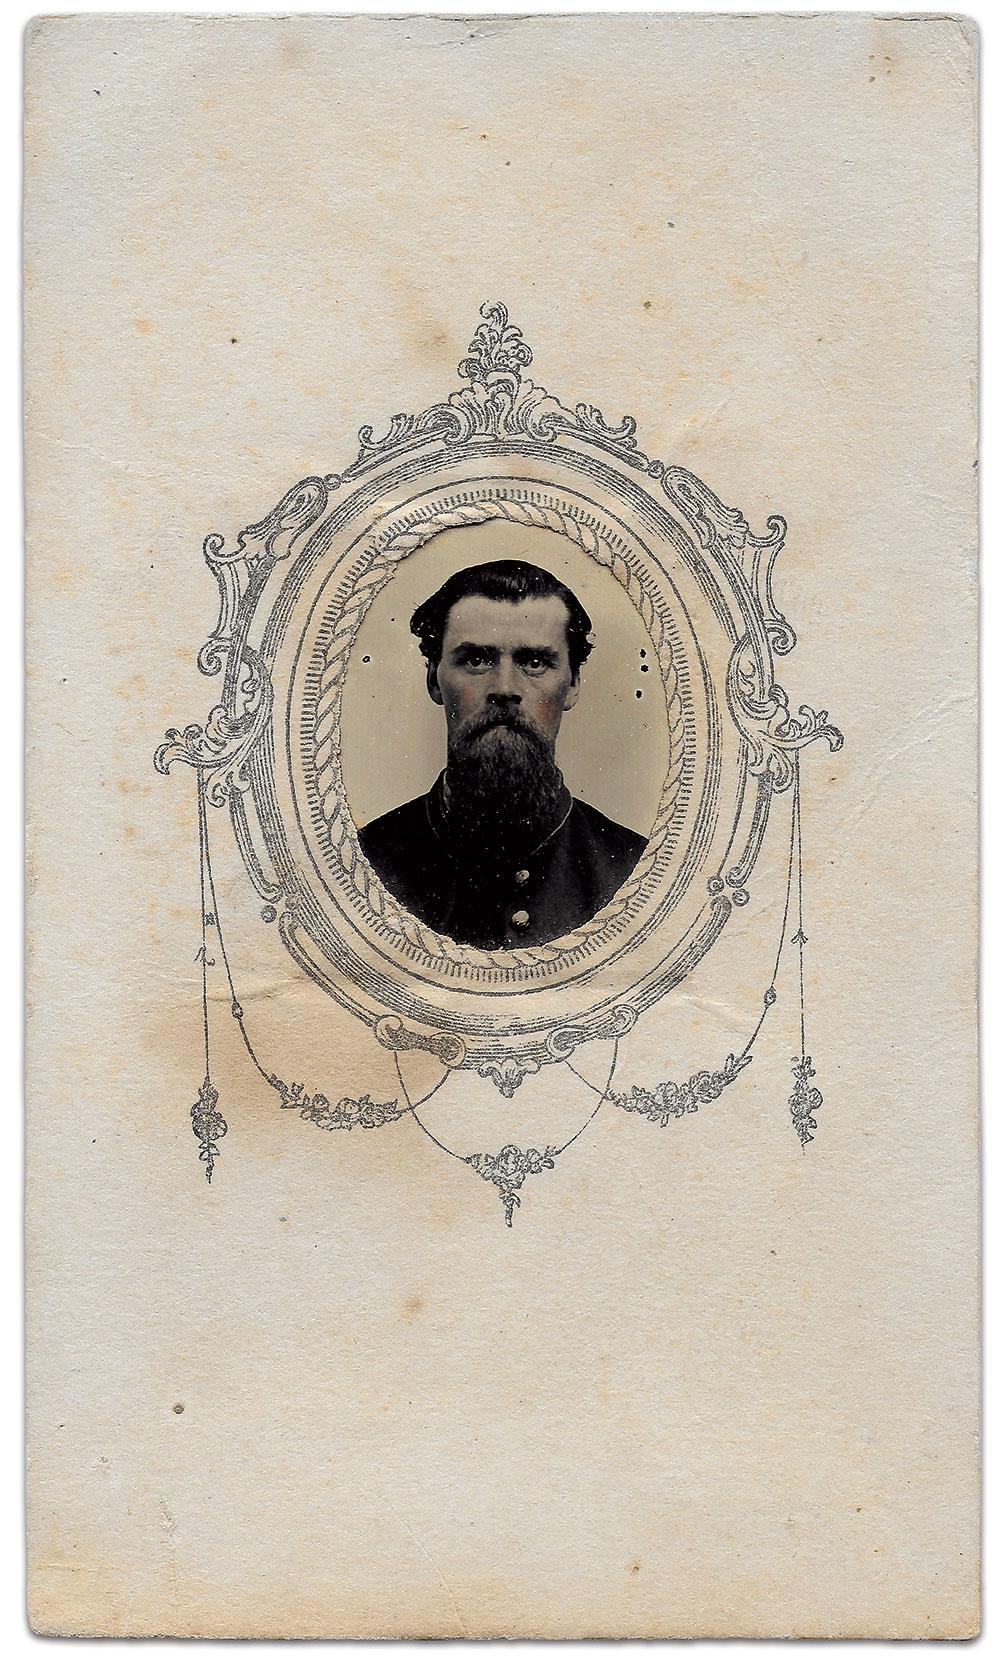 Gem-size tintype by Lothrop's Ferrotype Gallery of Philadelphia, Pa. Mark H. Dunkelman Collection.